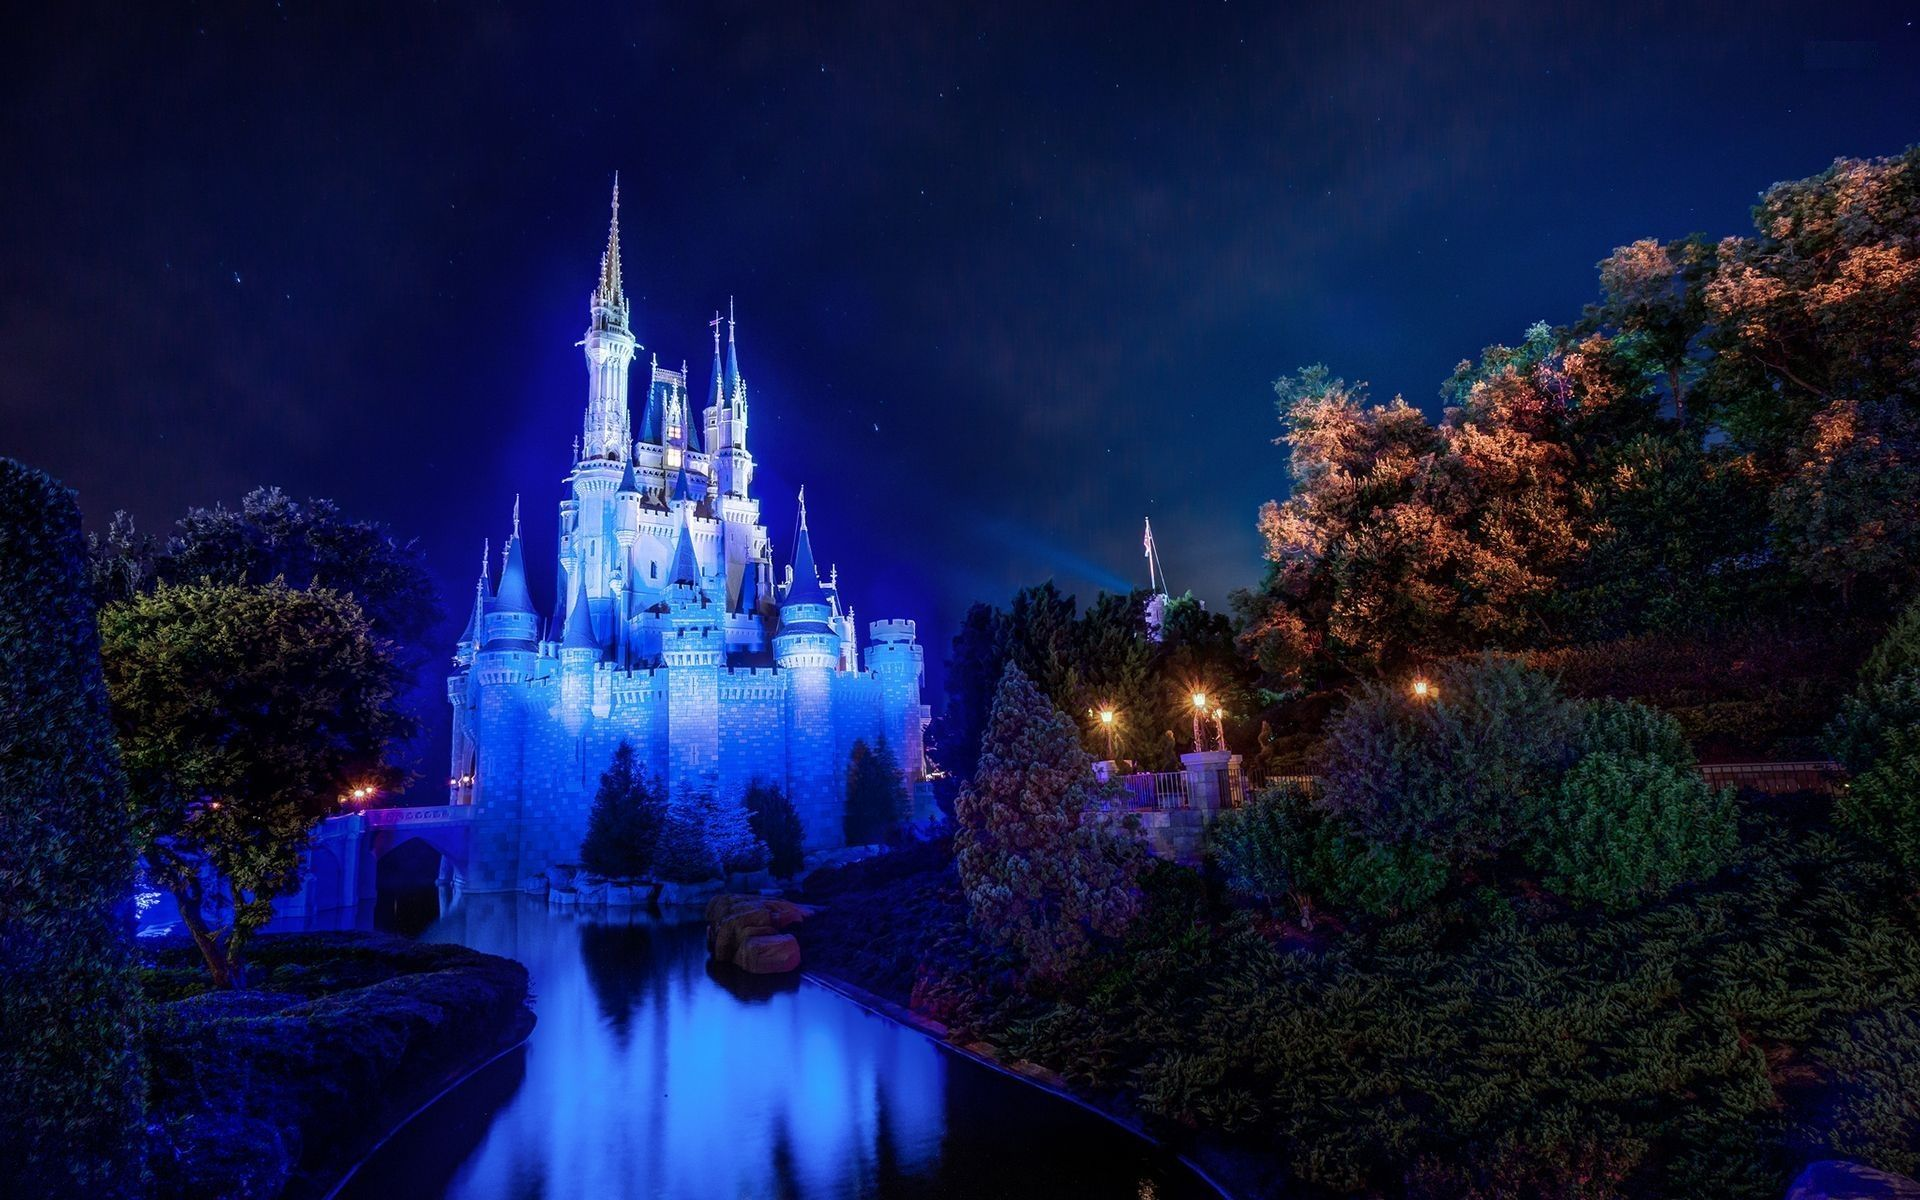 Disney Desktop Wallpaper Free In 2020 Disney Desktop Wallpaper Disney Background Disney Piano Music